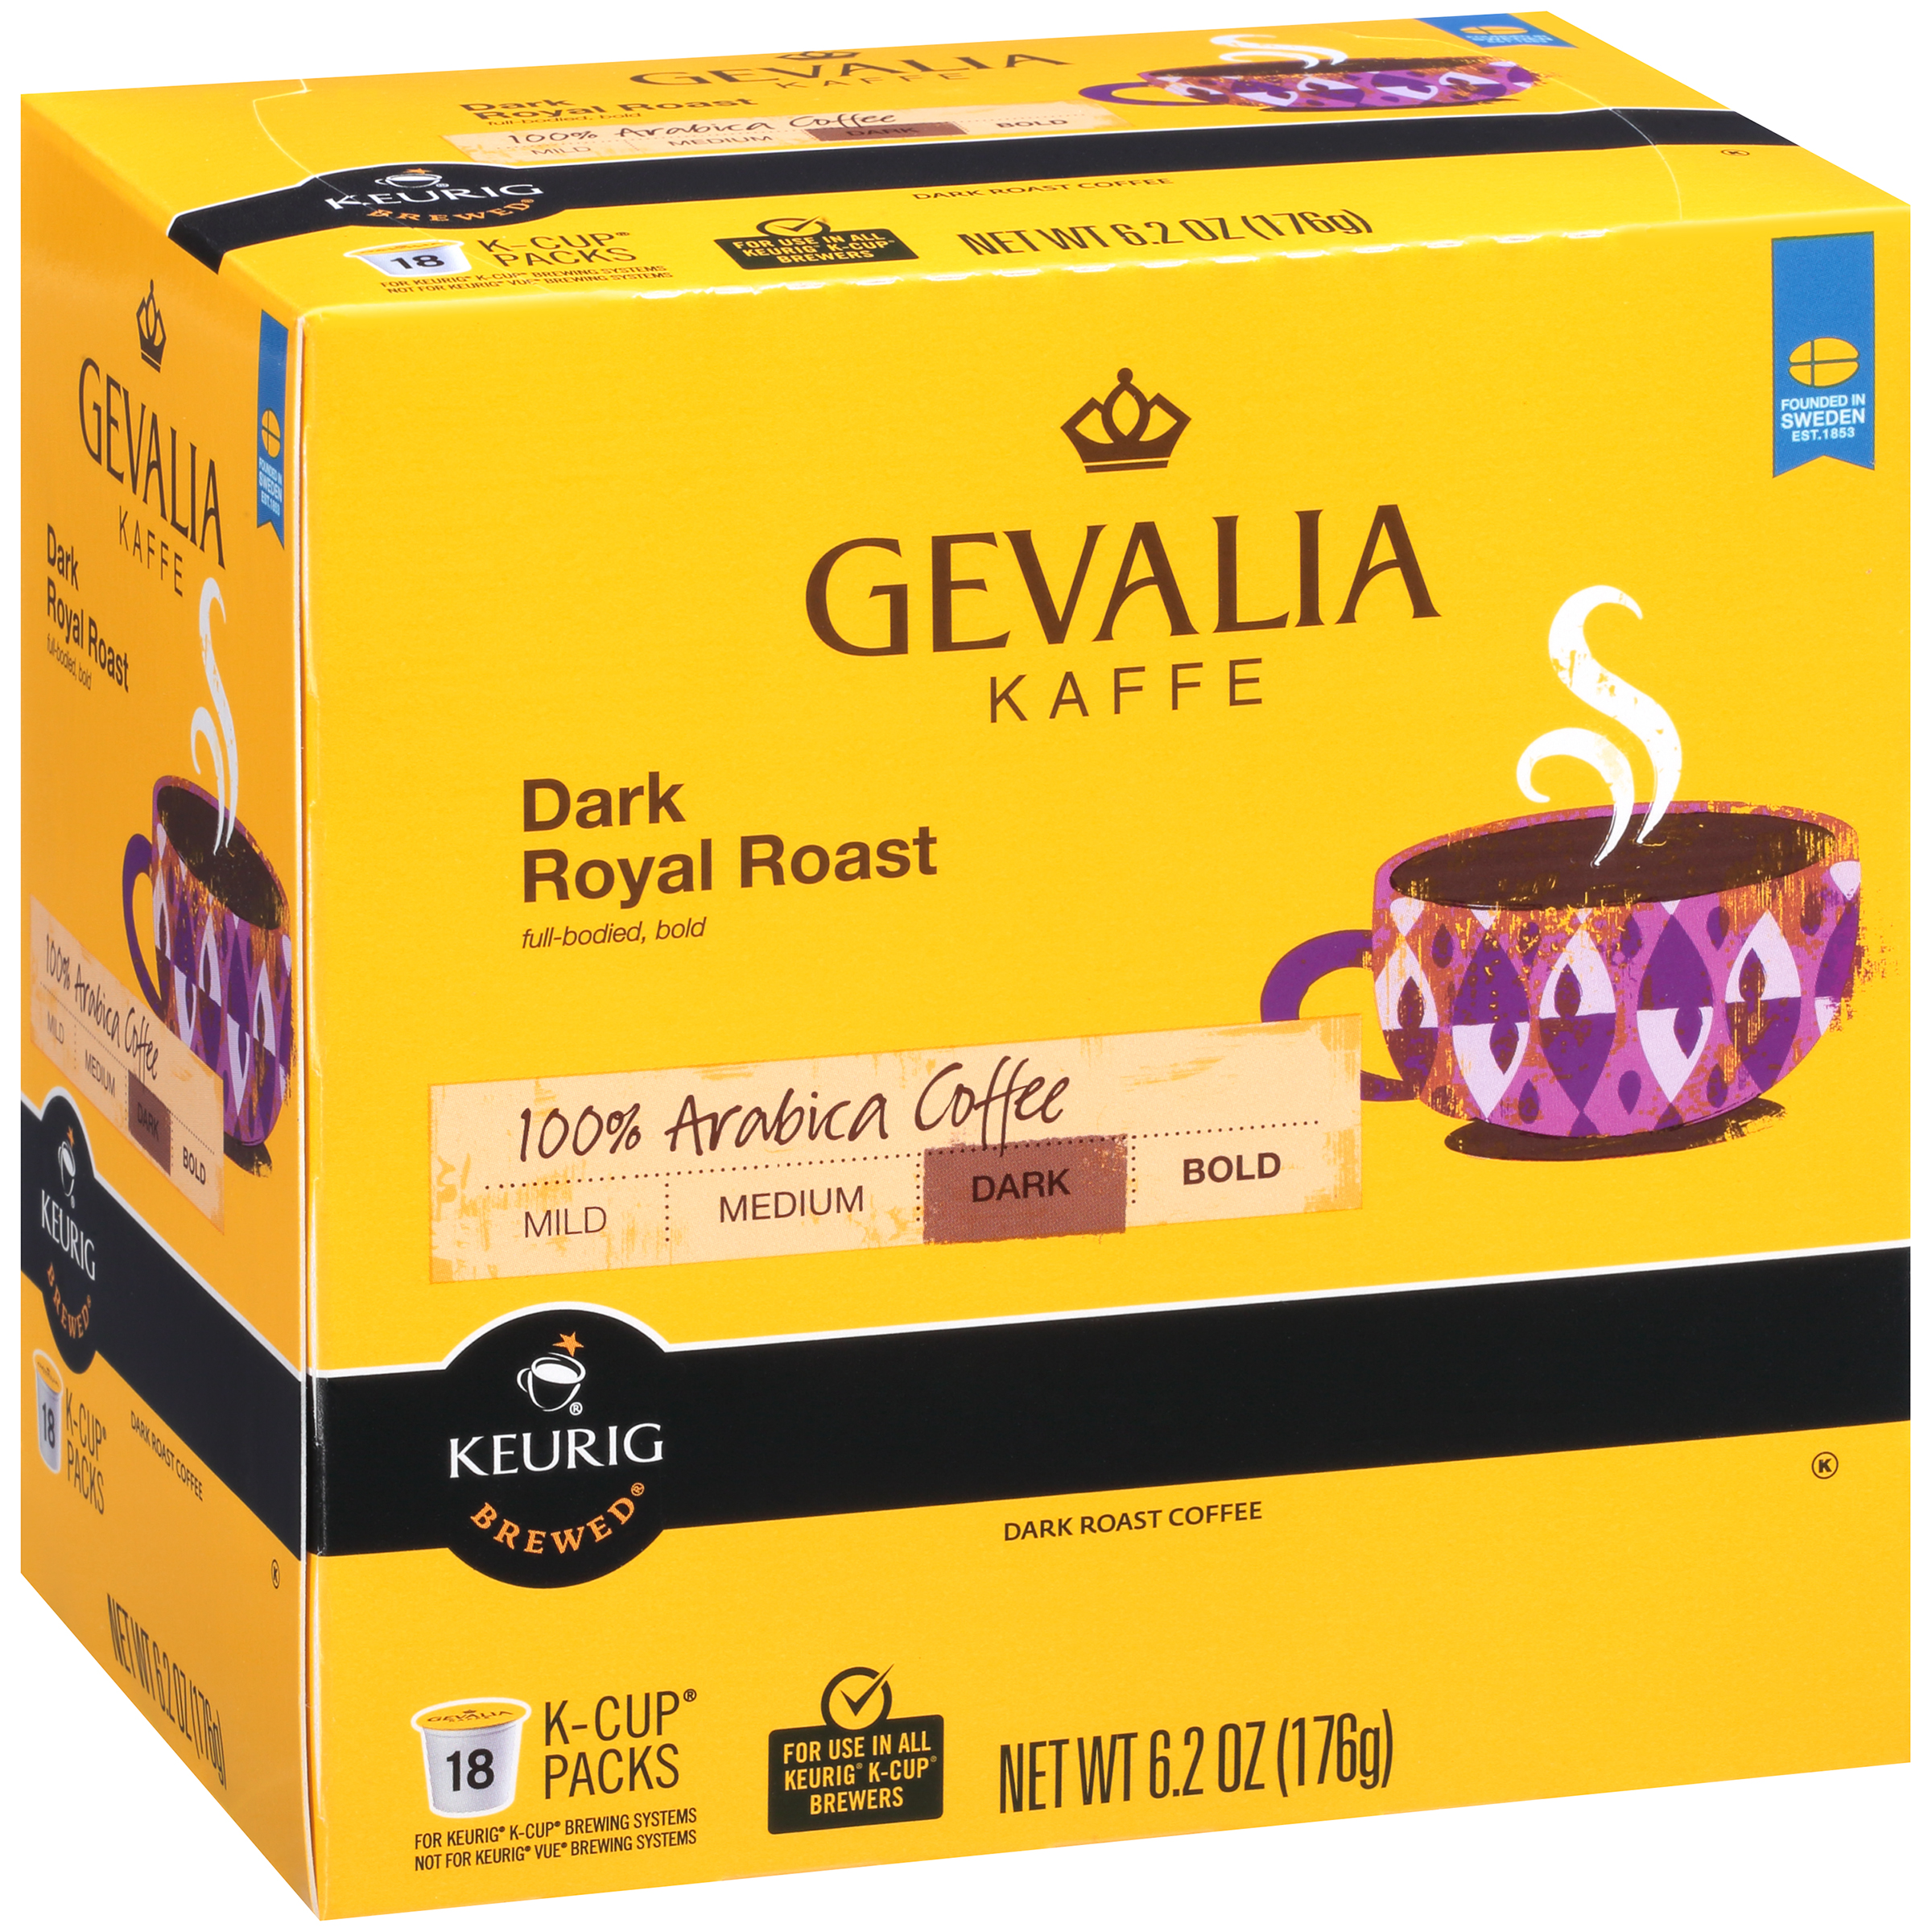 Gevalia Dark Royal Roast Coffee K-Cup® Pods 18 ct Box